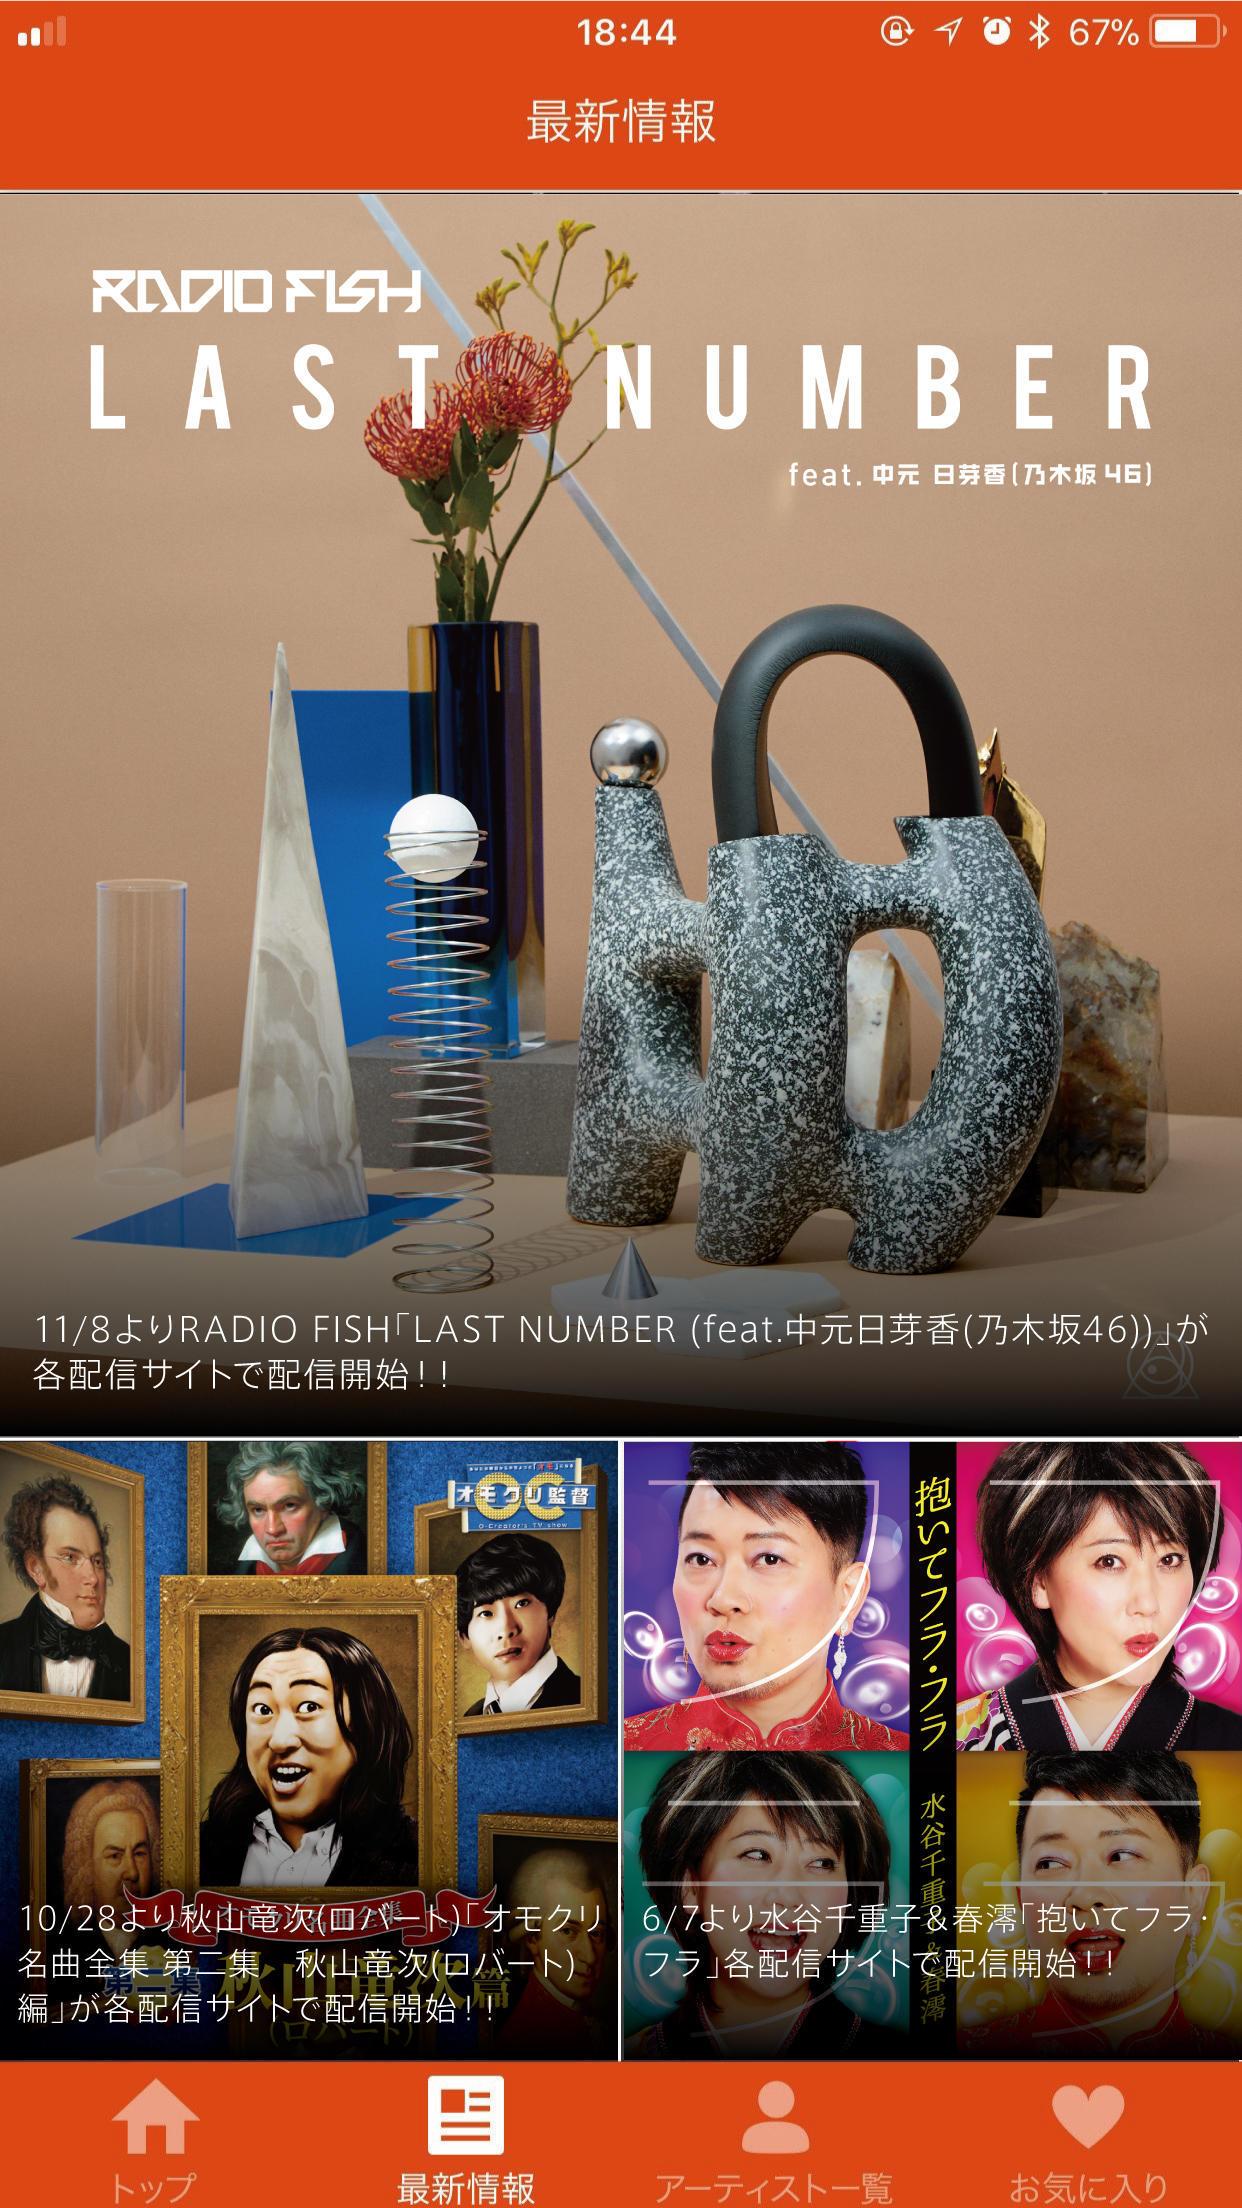 http://news.yoshimoto.co.jp/20180131163013-a0ce8fa3108c774b4962deb6745dcd59a90c6af6.jpg